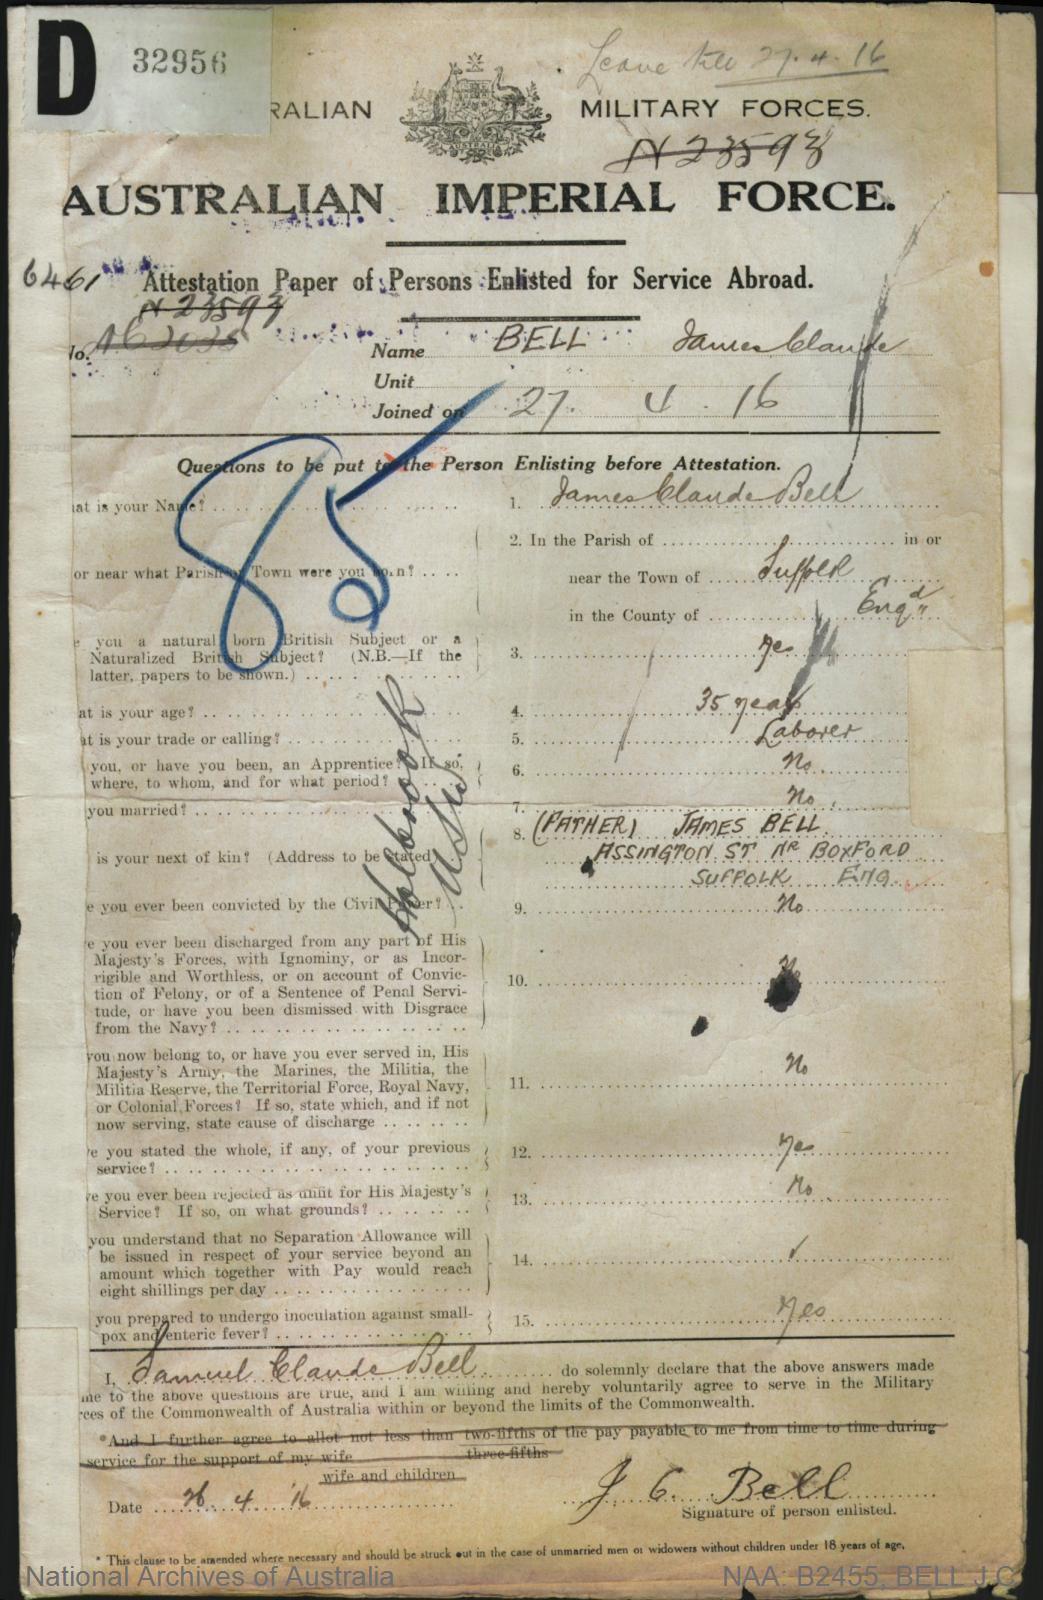 Bell James Claude : SERN 6461 : POB Suffolk England : POE Cootamundra NSW : NOK F Bell James